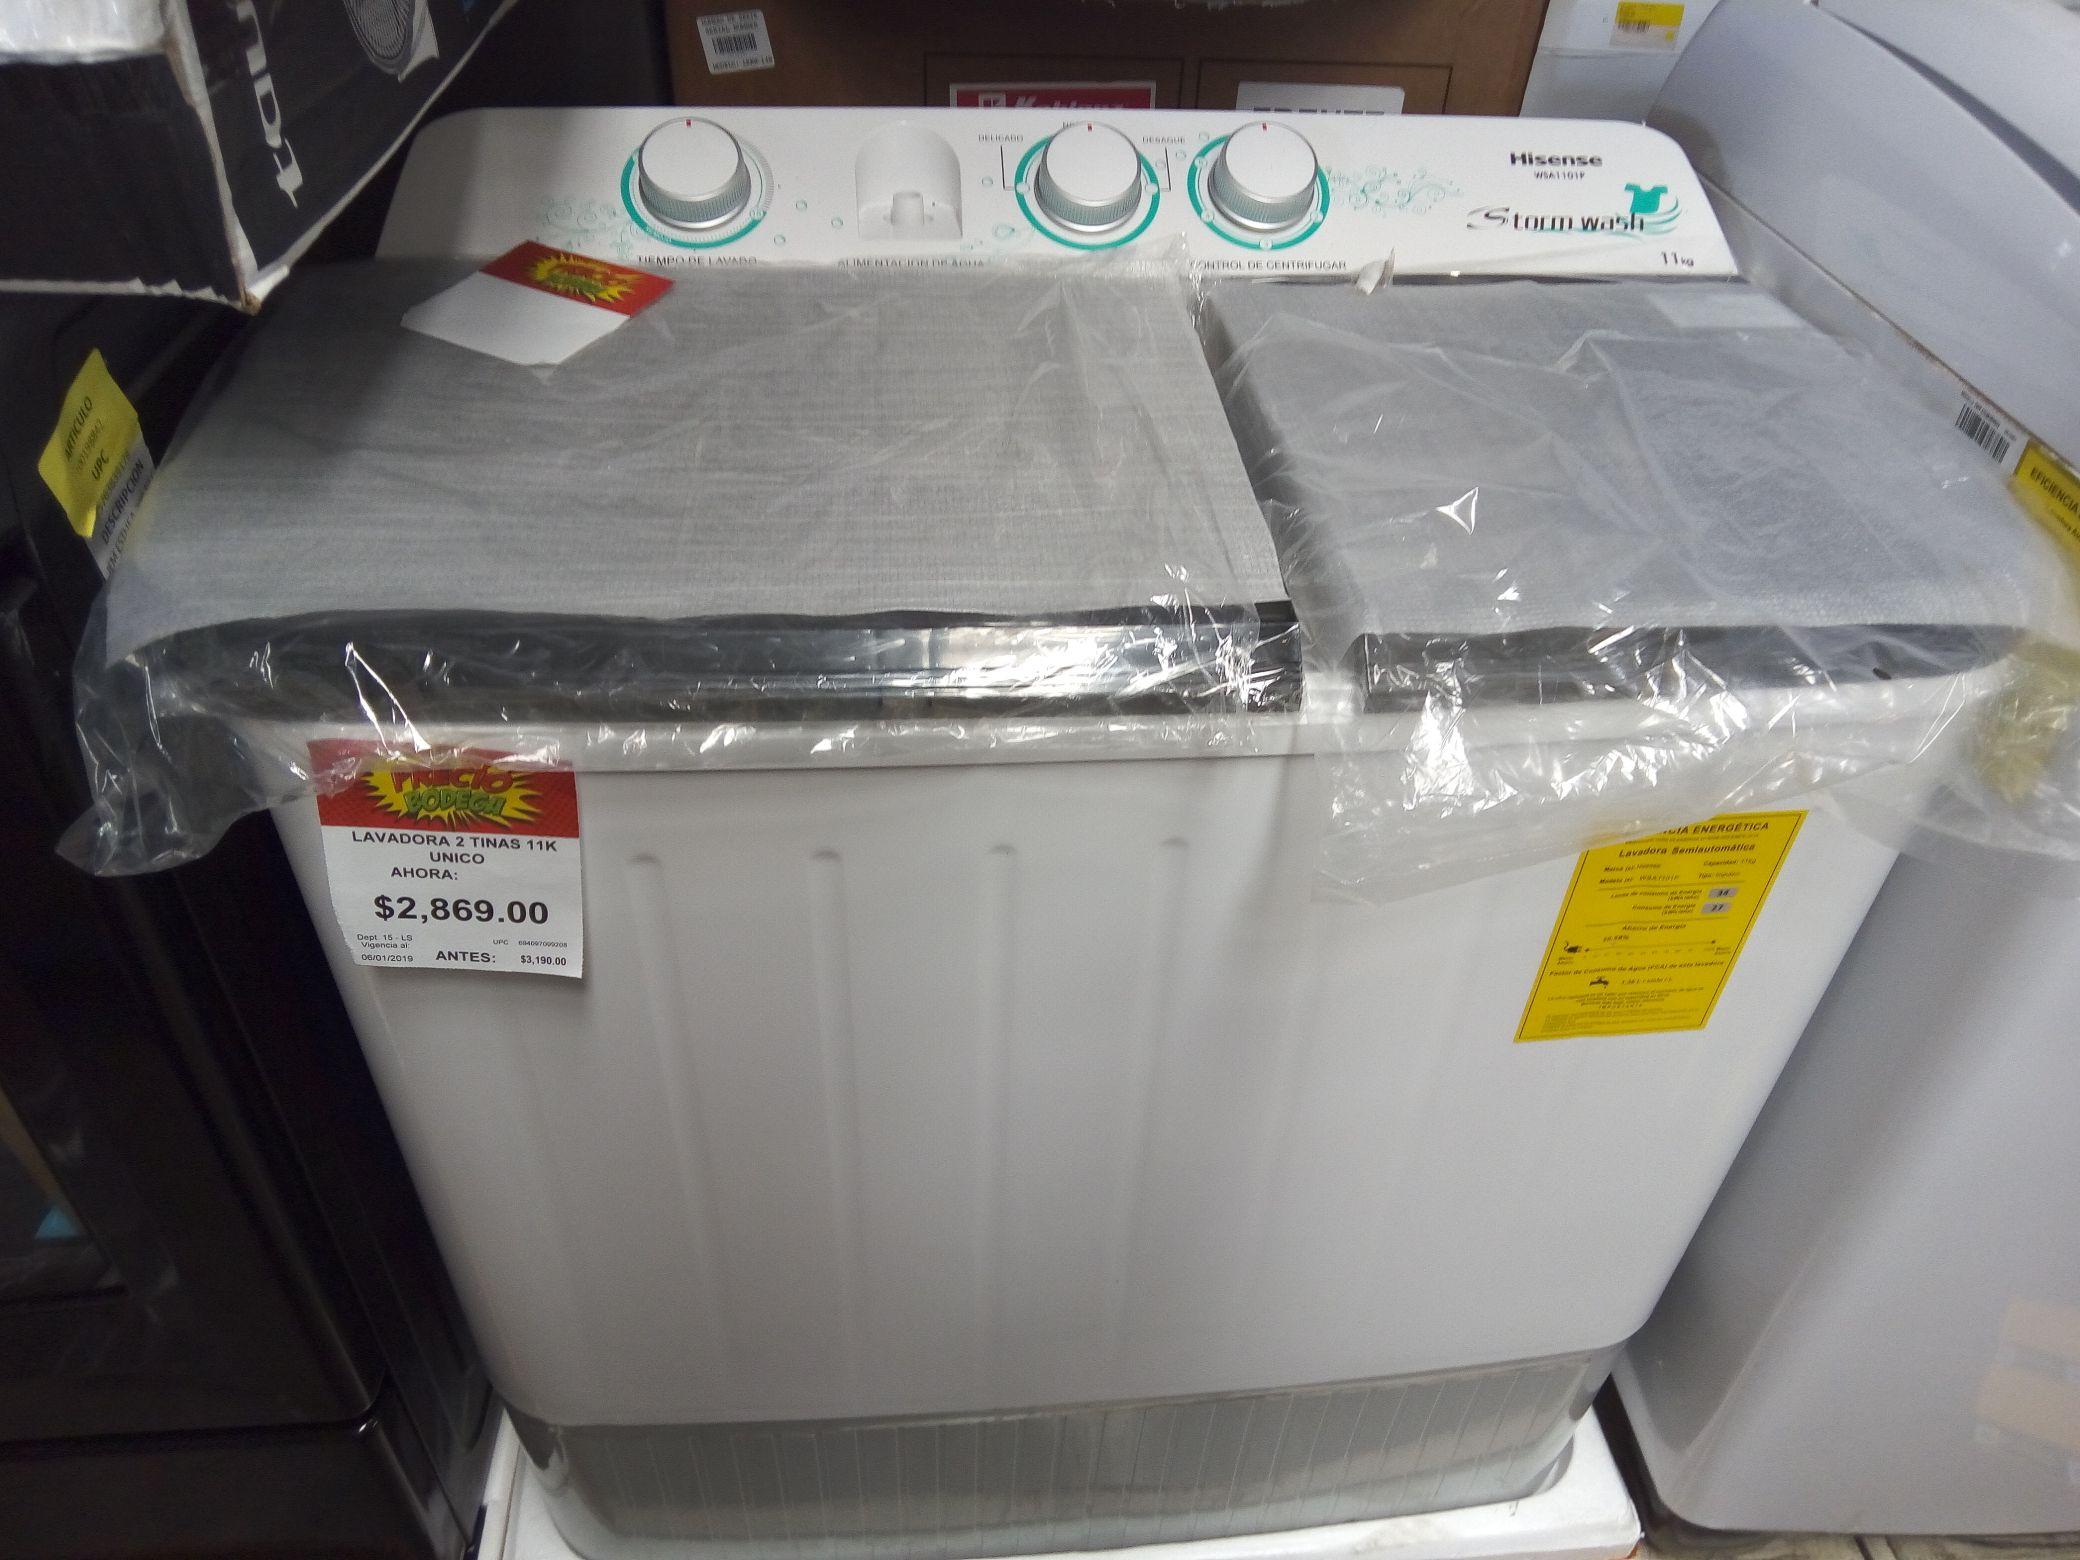 Bodega Aurrerá: Lavadora 2 tinas Hisense 11 kg